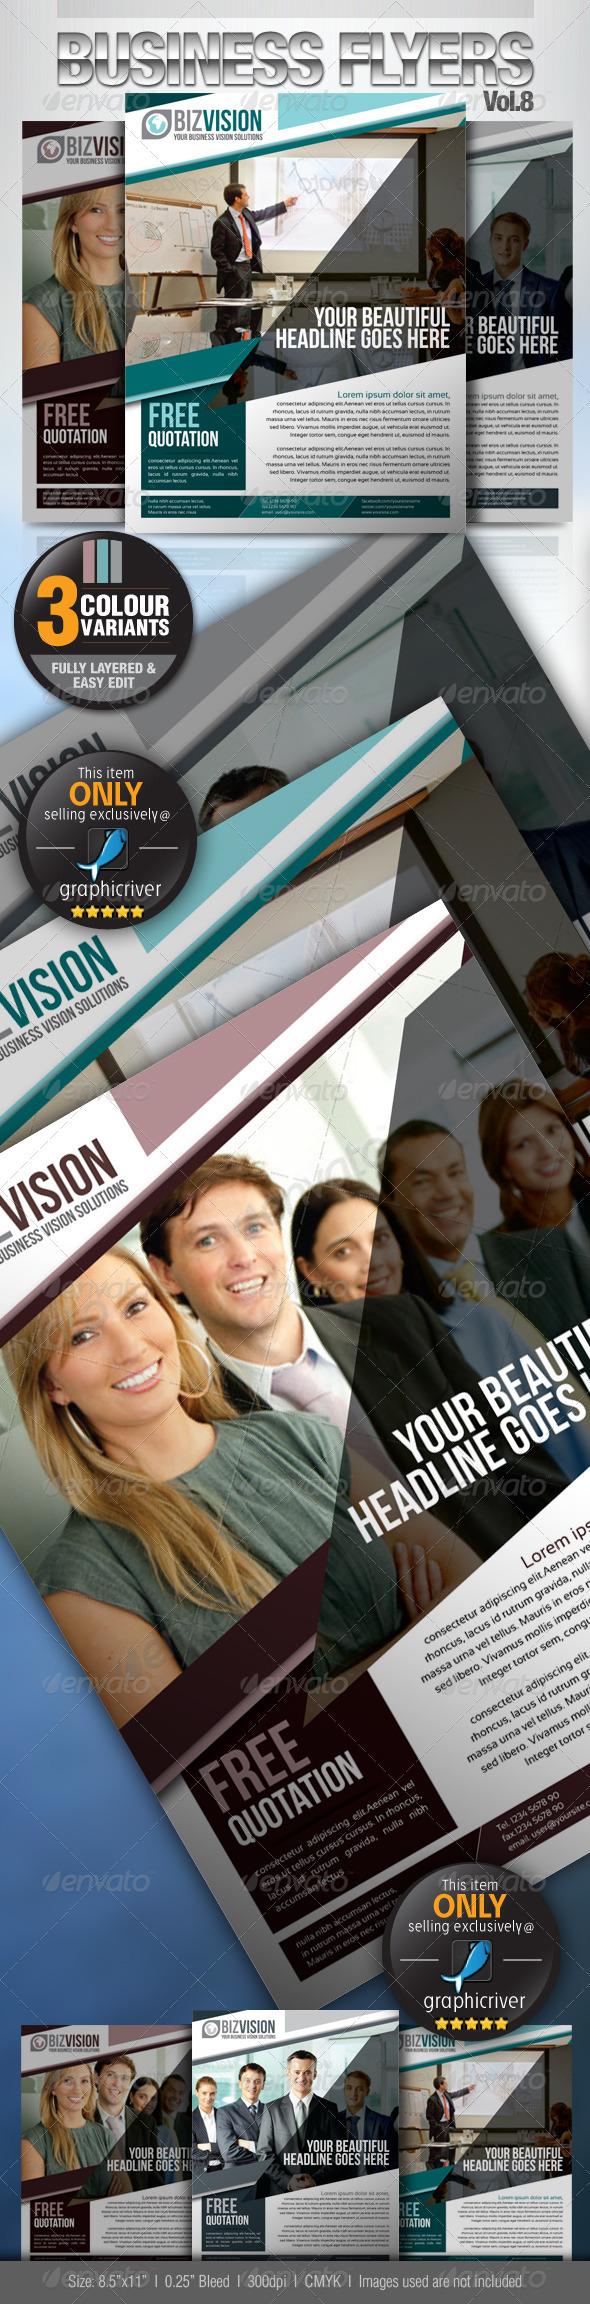 GraphicRiver Simple & Clean Corporate Flyer Vol.8 3271528